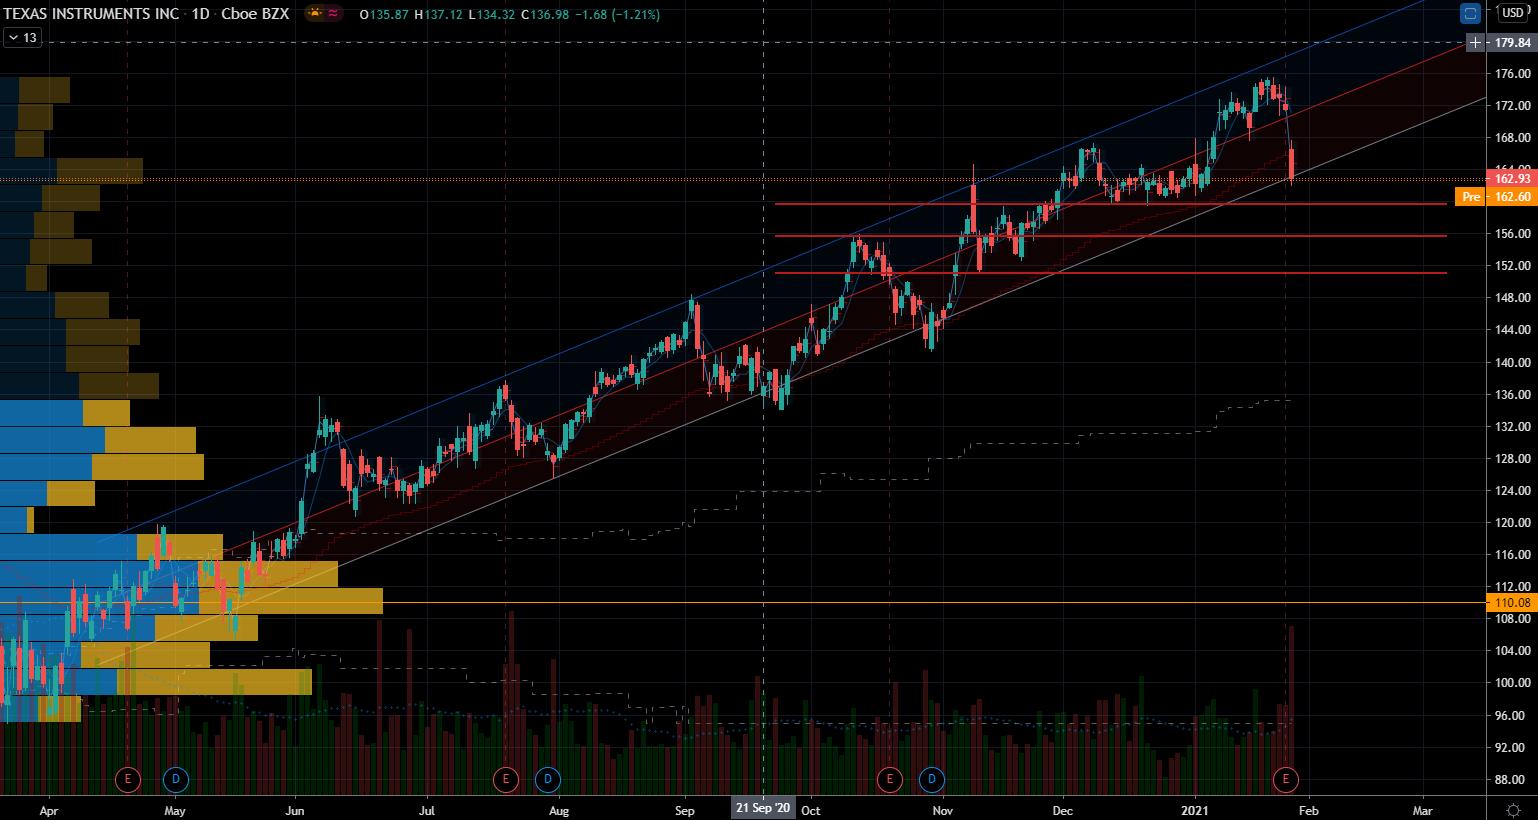 Mega-Cap Stocks: Texas Instruments (TXN) Stock Chart Showing Support Levels